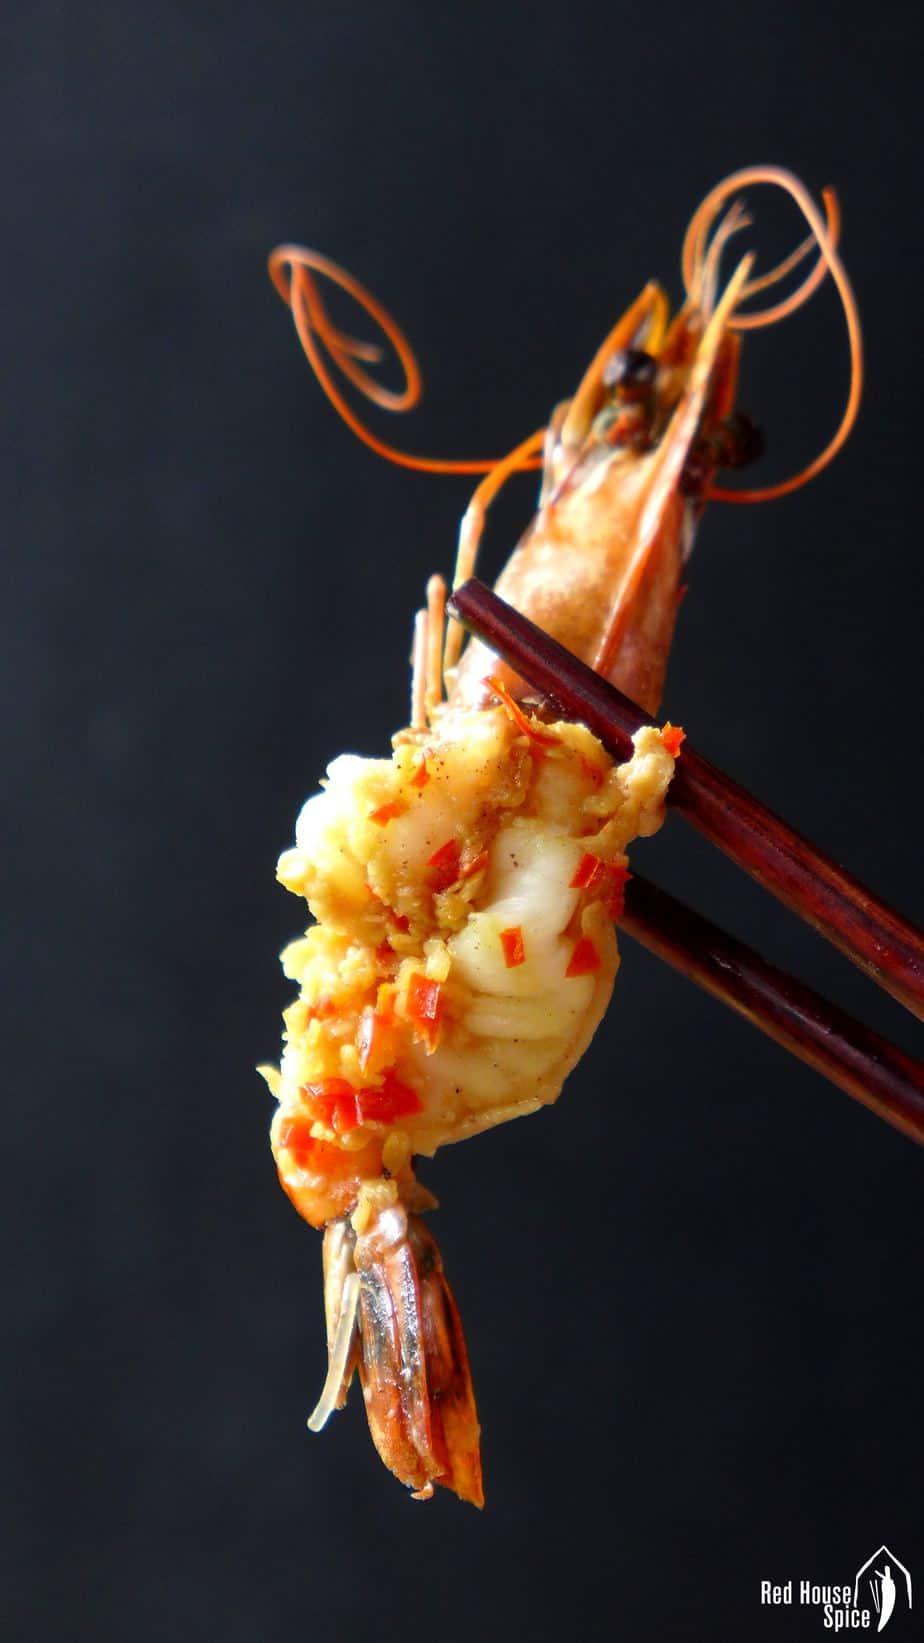 A garlic seasoned prawn held by a pair of chopsticks.